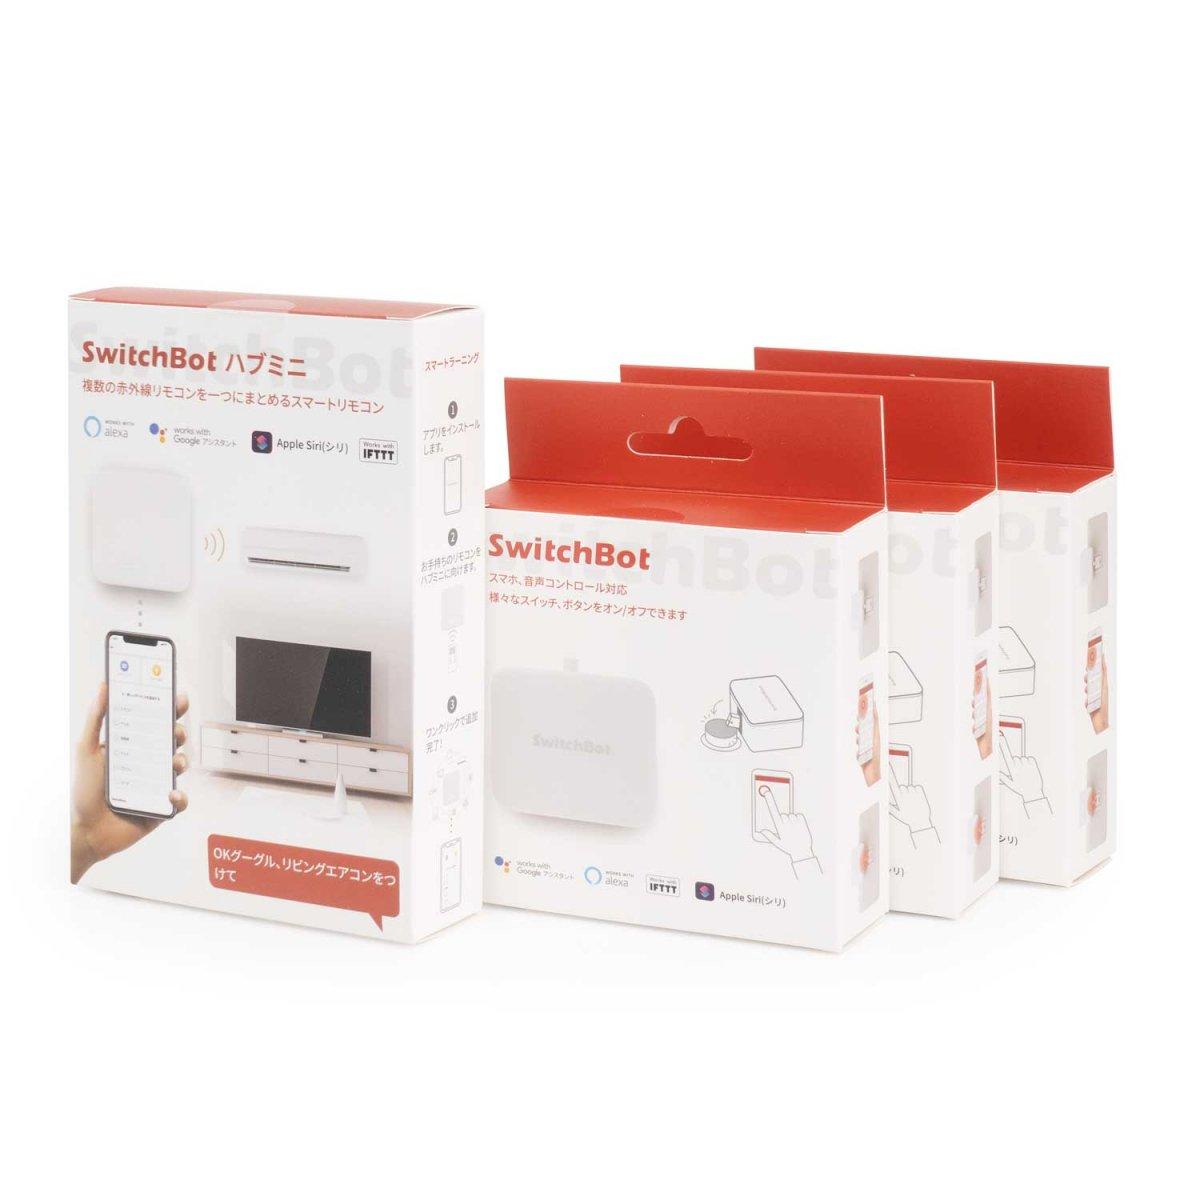 SwitchBot x3 + SwitchBotハブミニ(Hub Mini)セット